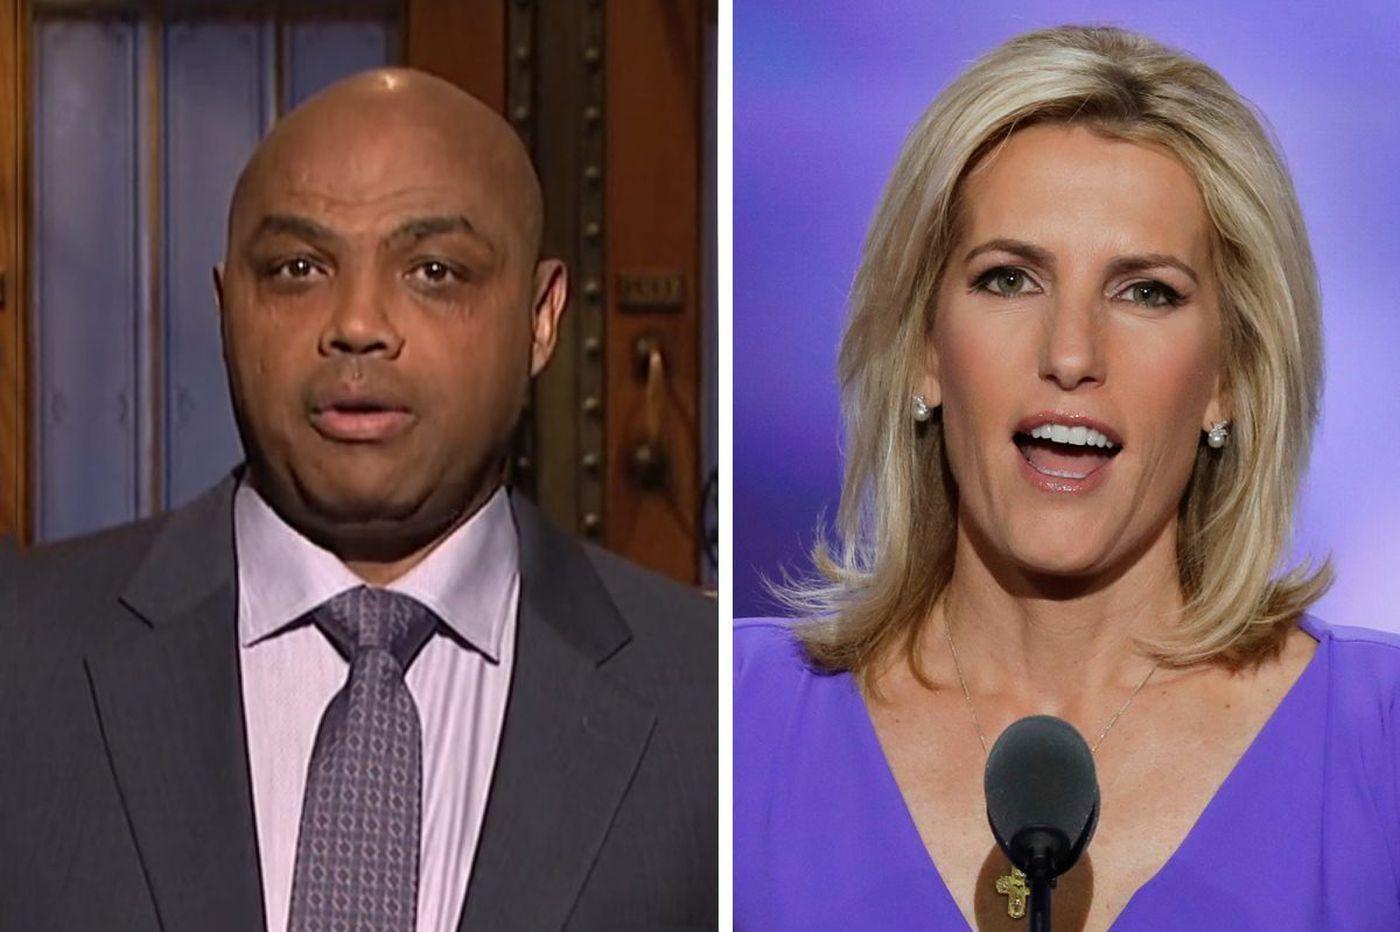 Saturday Night Live: Charles Barkley calls out Fox News 'lady' Laura Ingraham